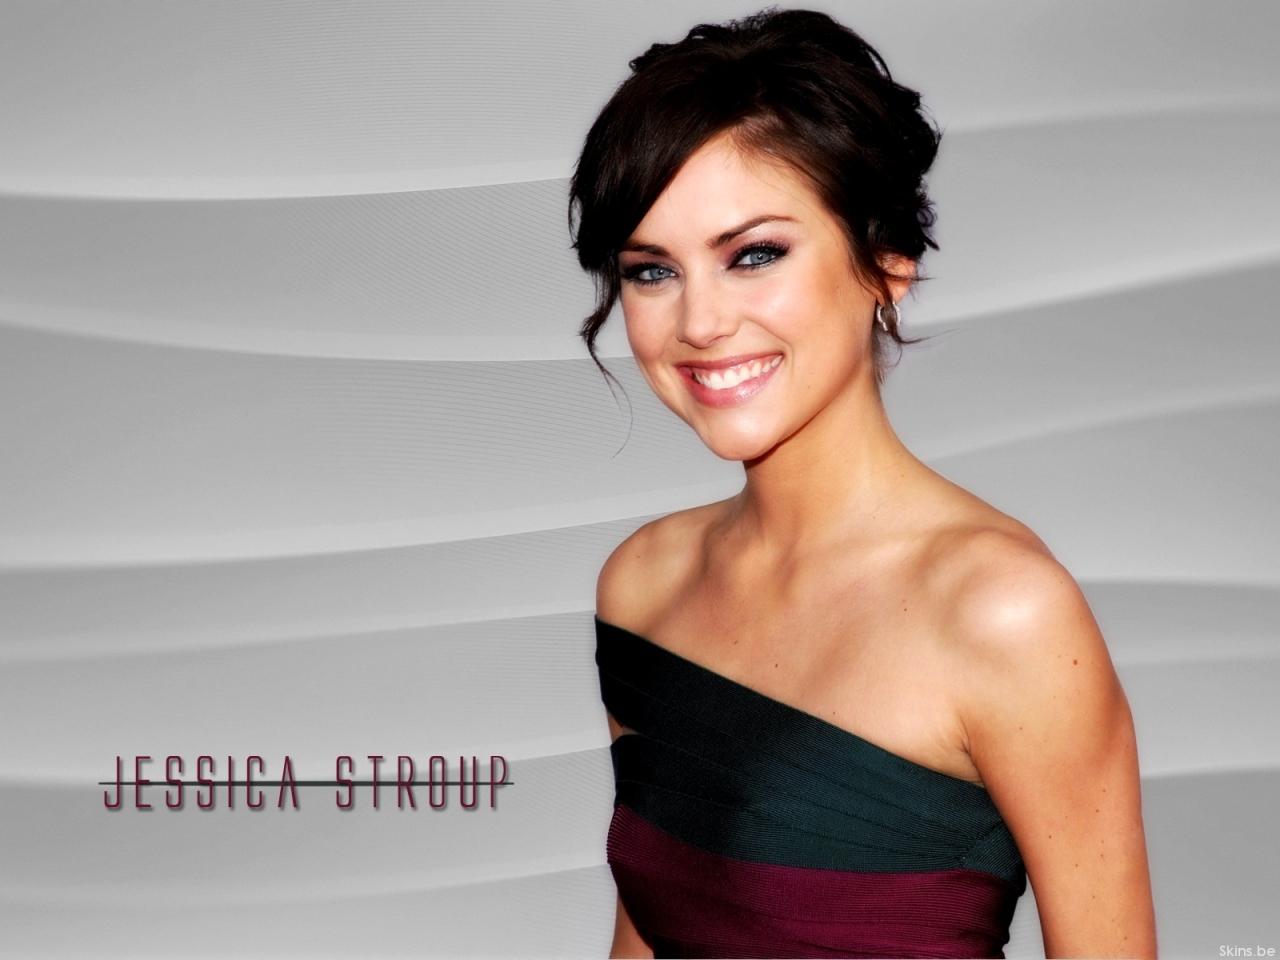 Jessica Stroup wallpaper (#35594)